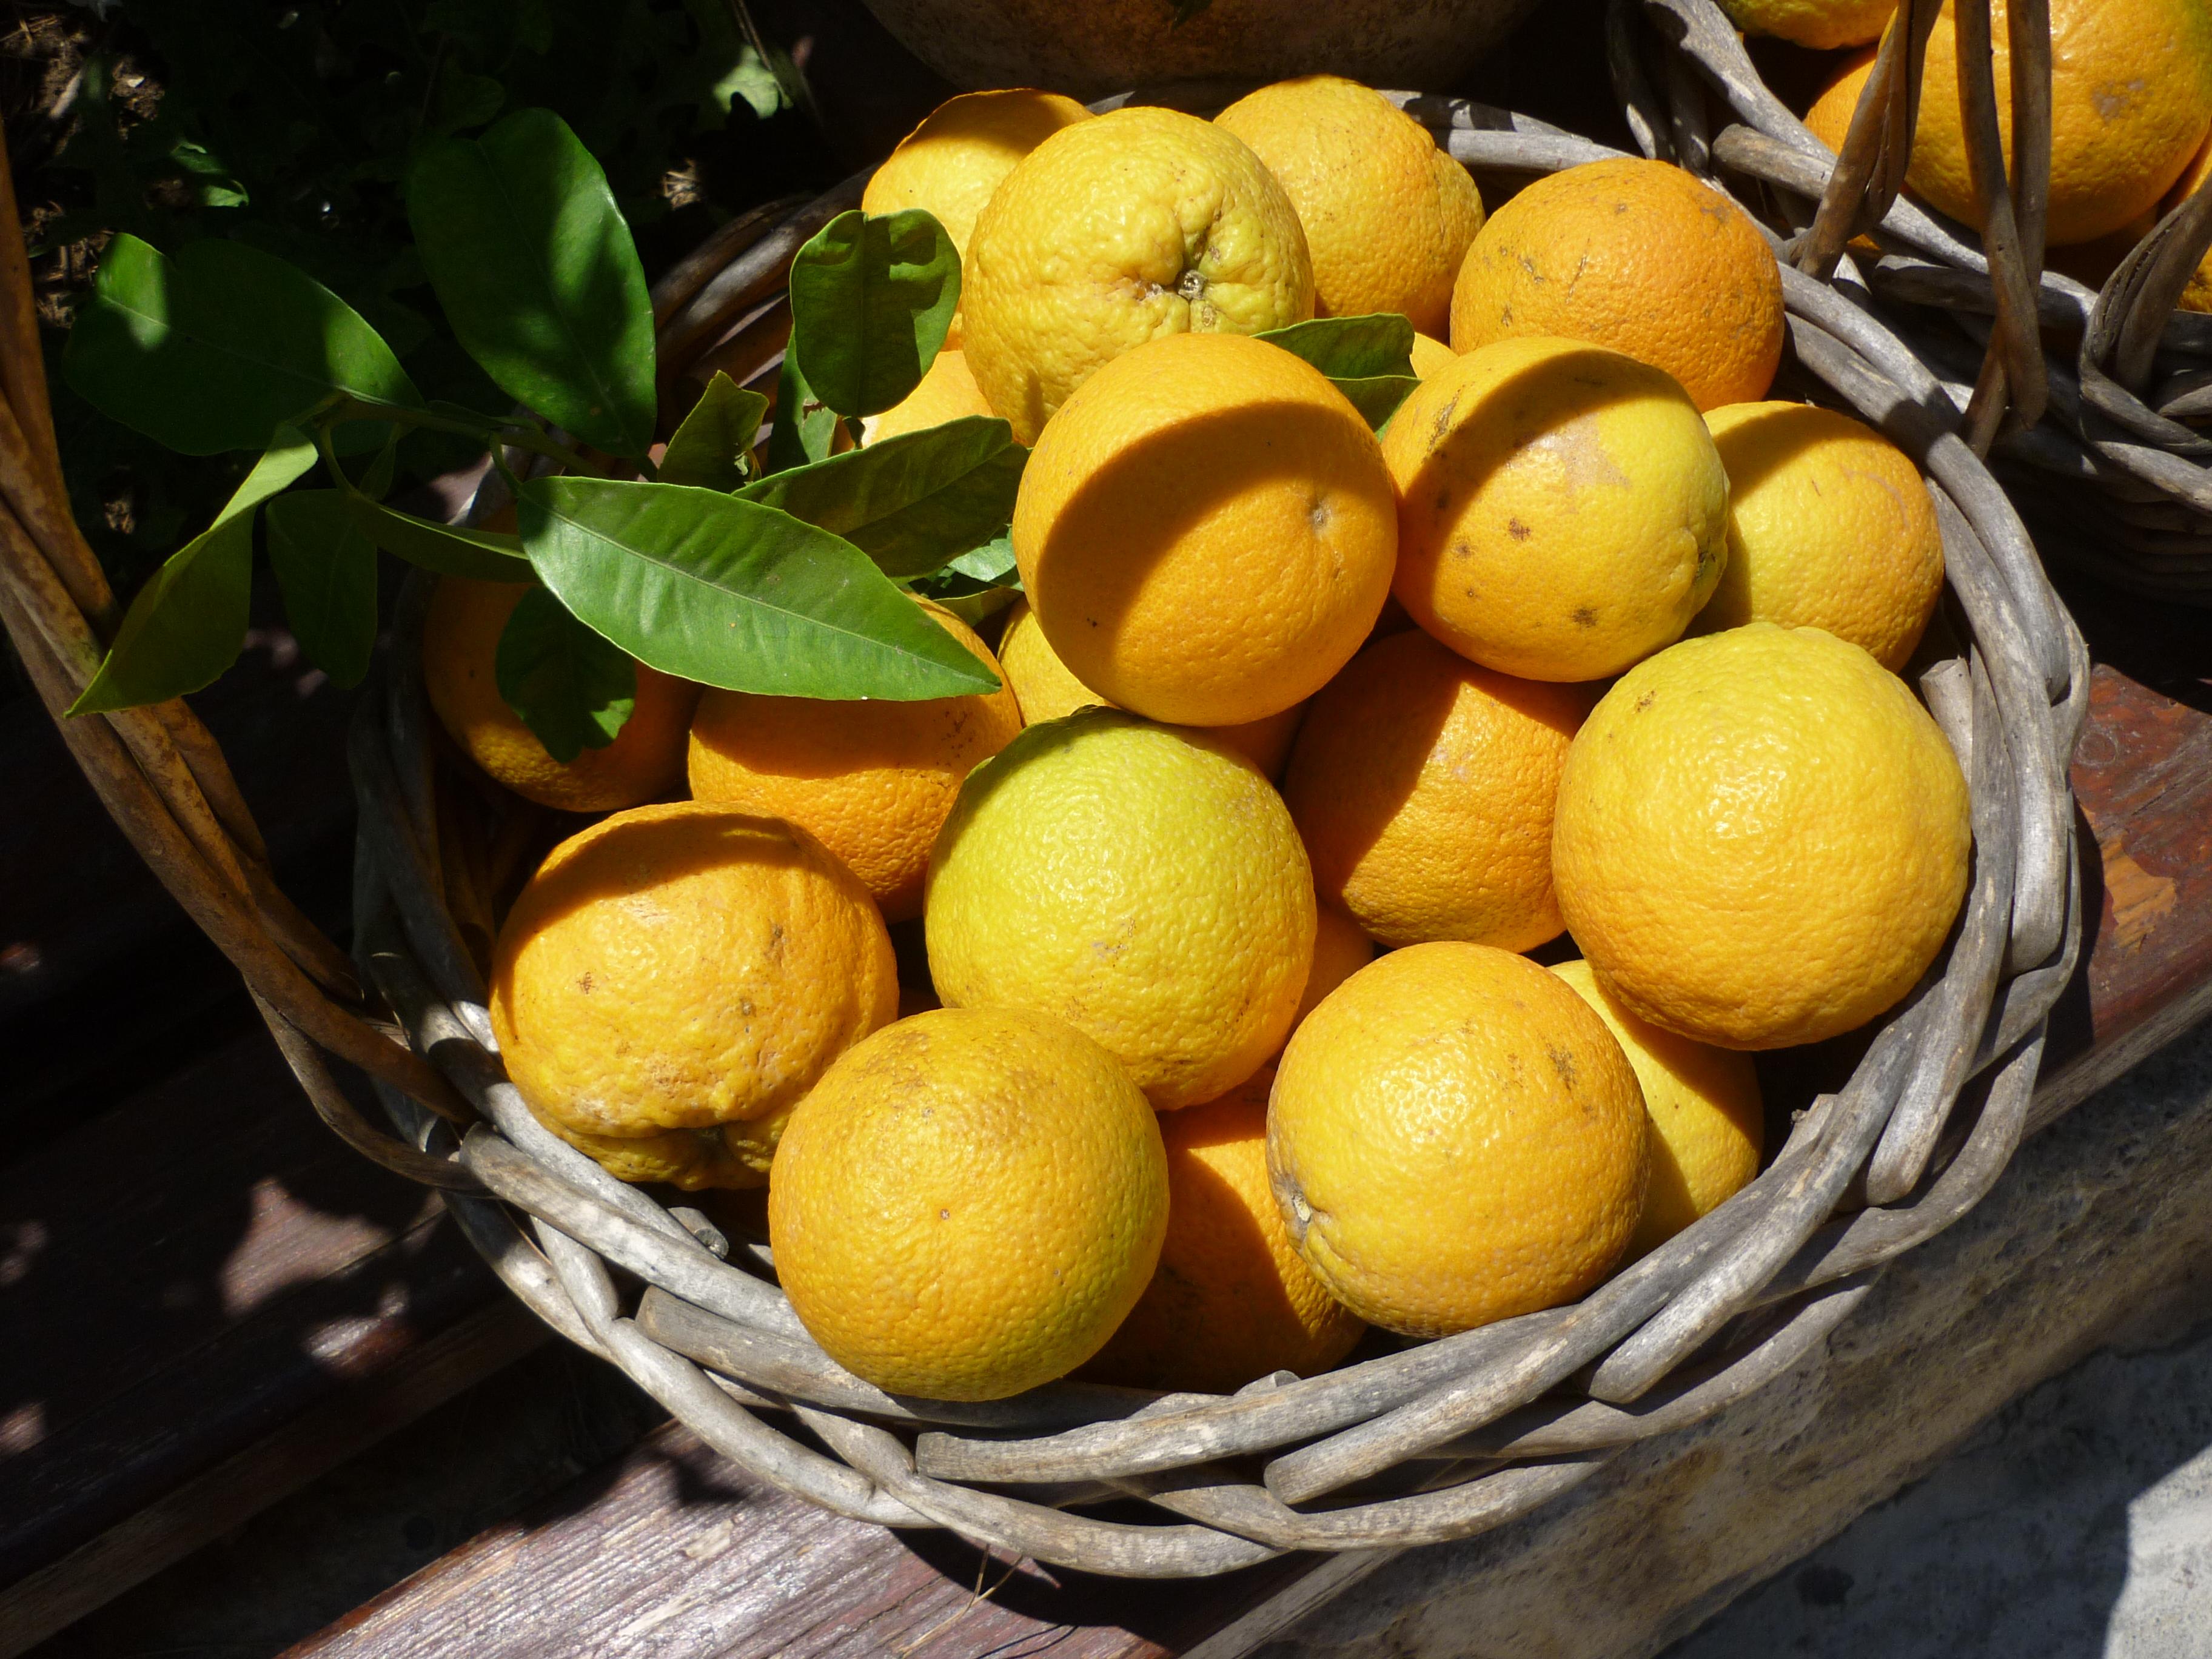 http://upload.wikimedia.org/wikipedia/commons/c/ce/20120628_panier-oranges.jpg?uselang=fr